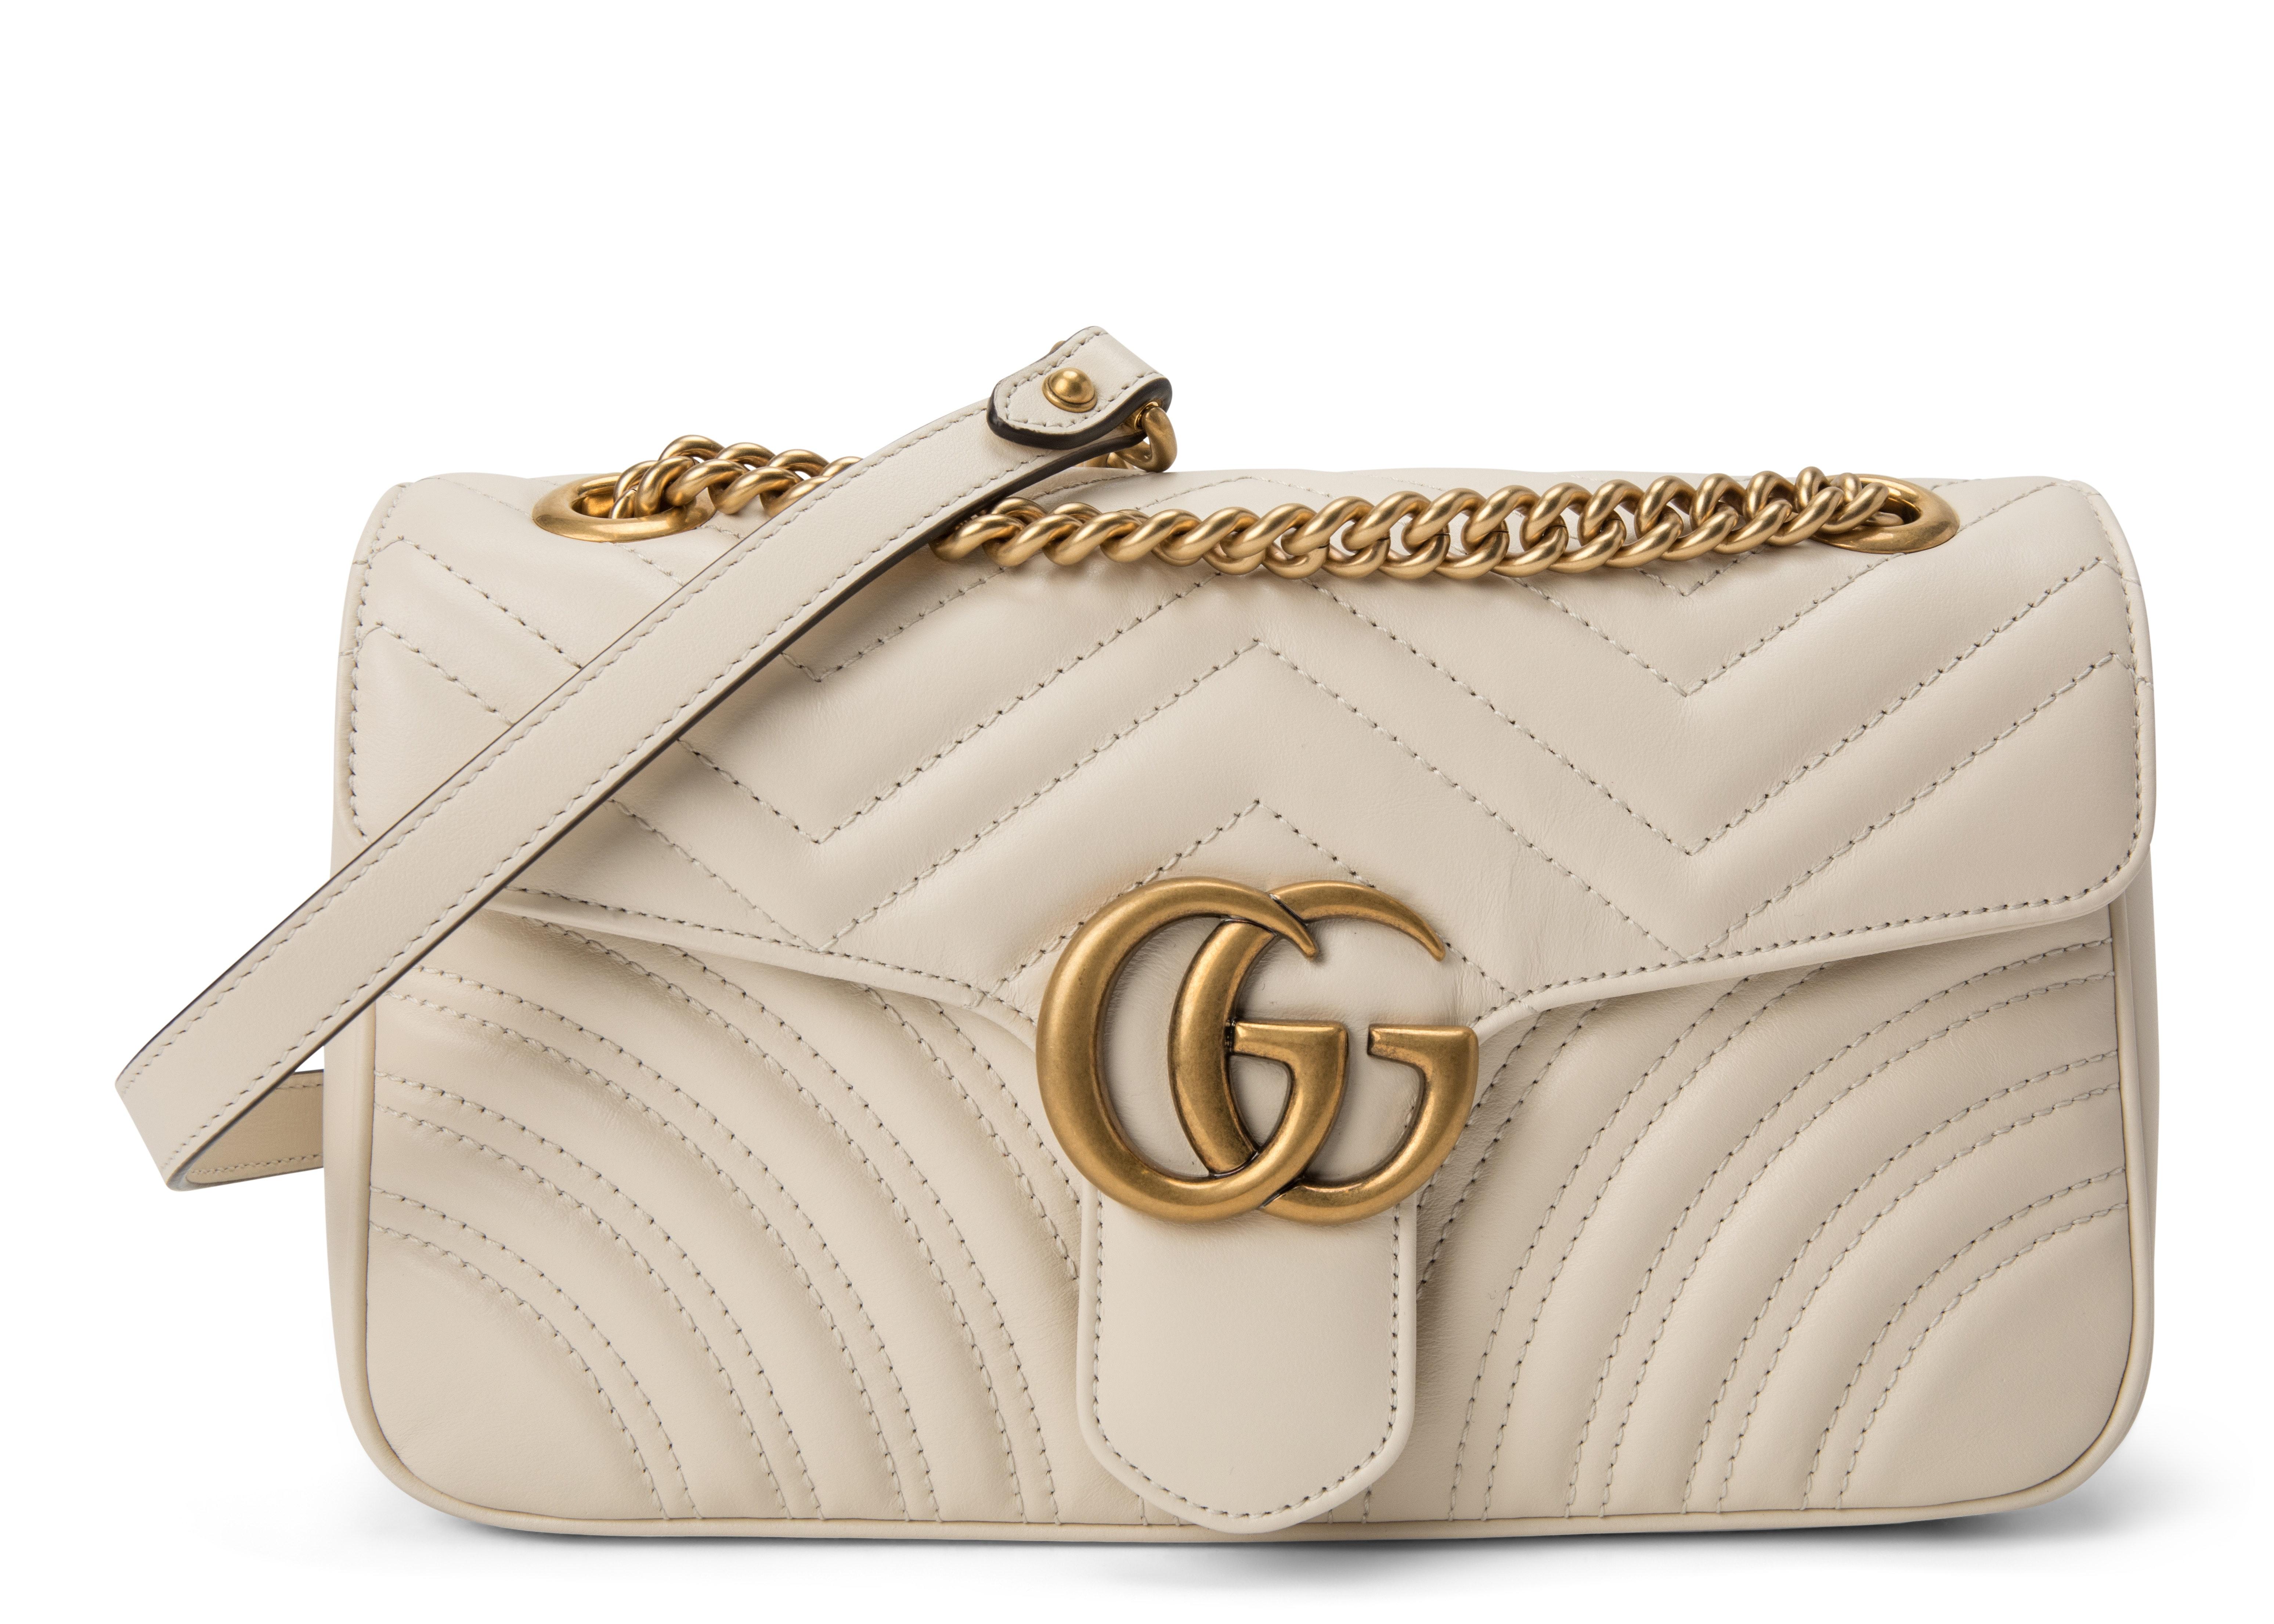 Gucci GG Marmont Shoulder Bag Matelasse Small White